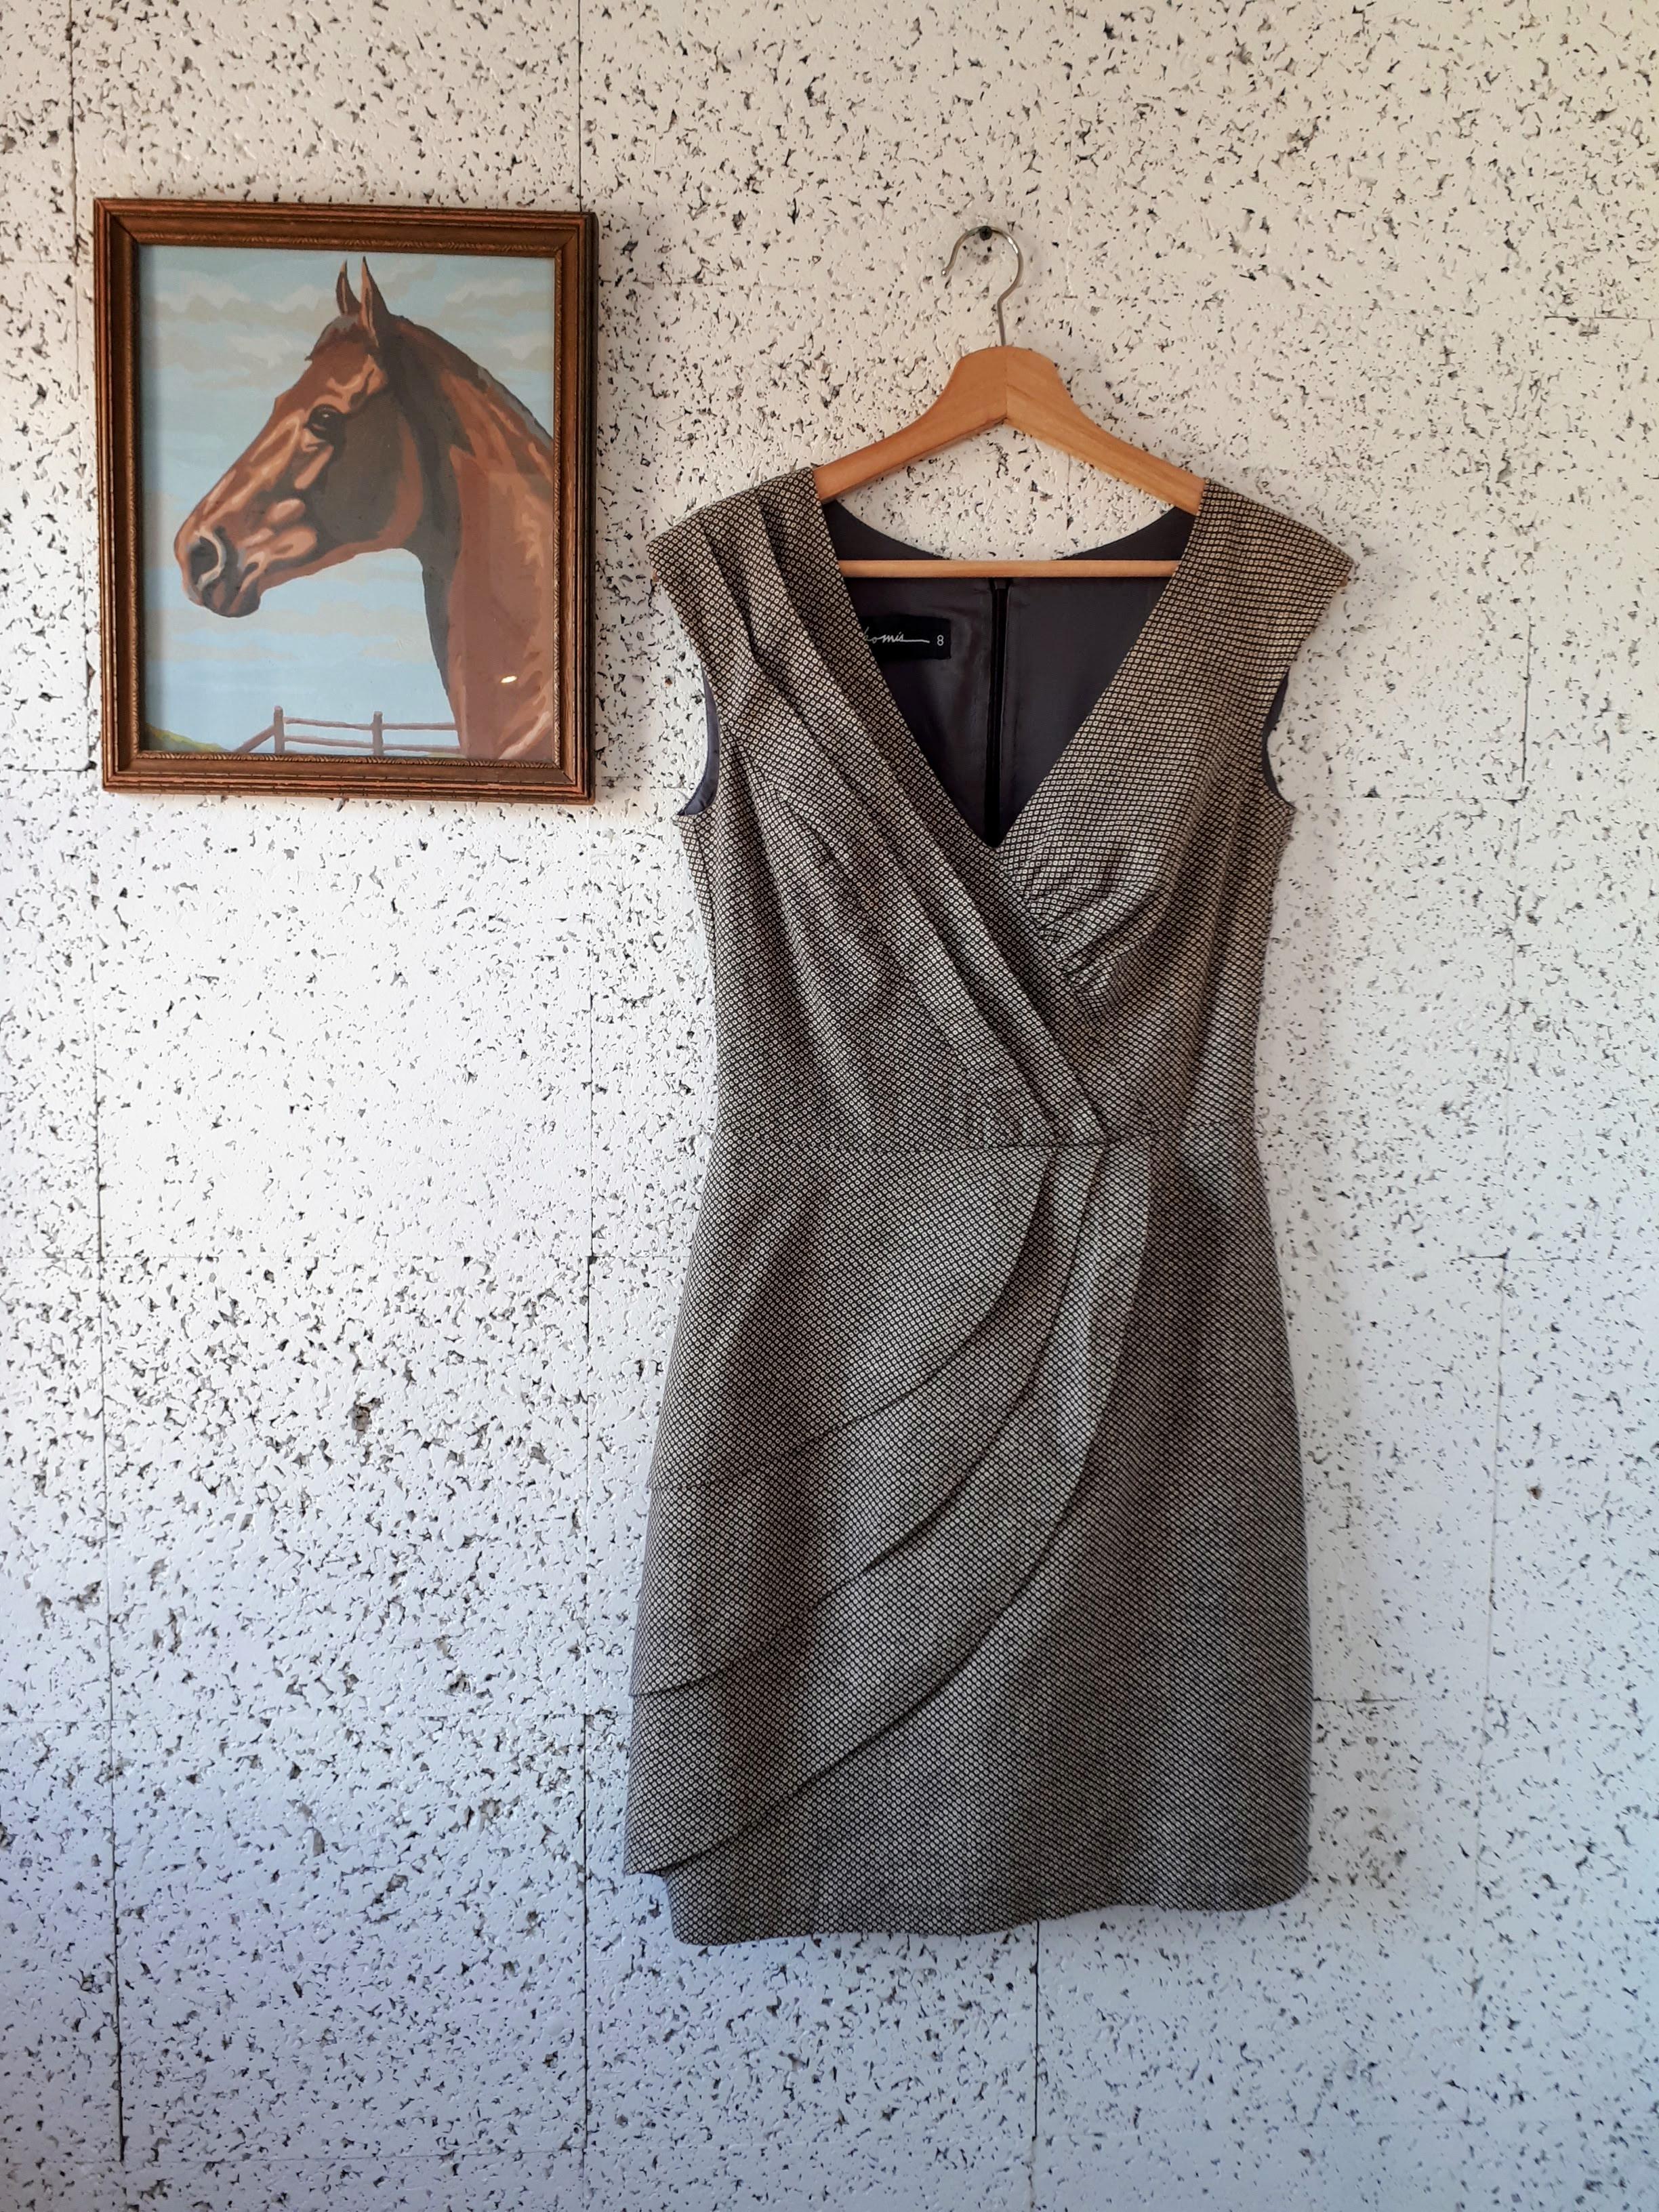 Nokomi dress; Size 8, $52